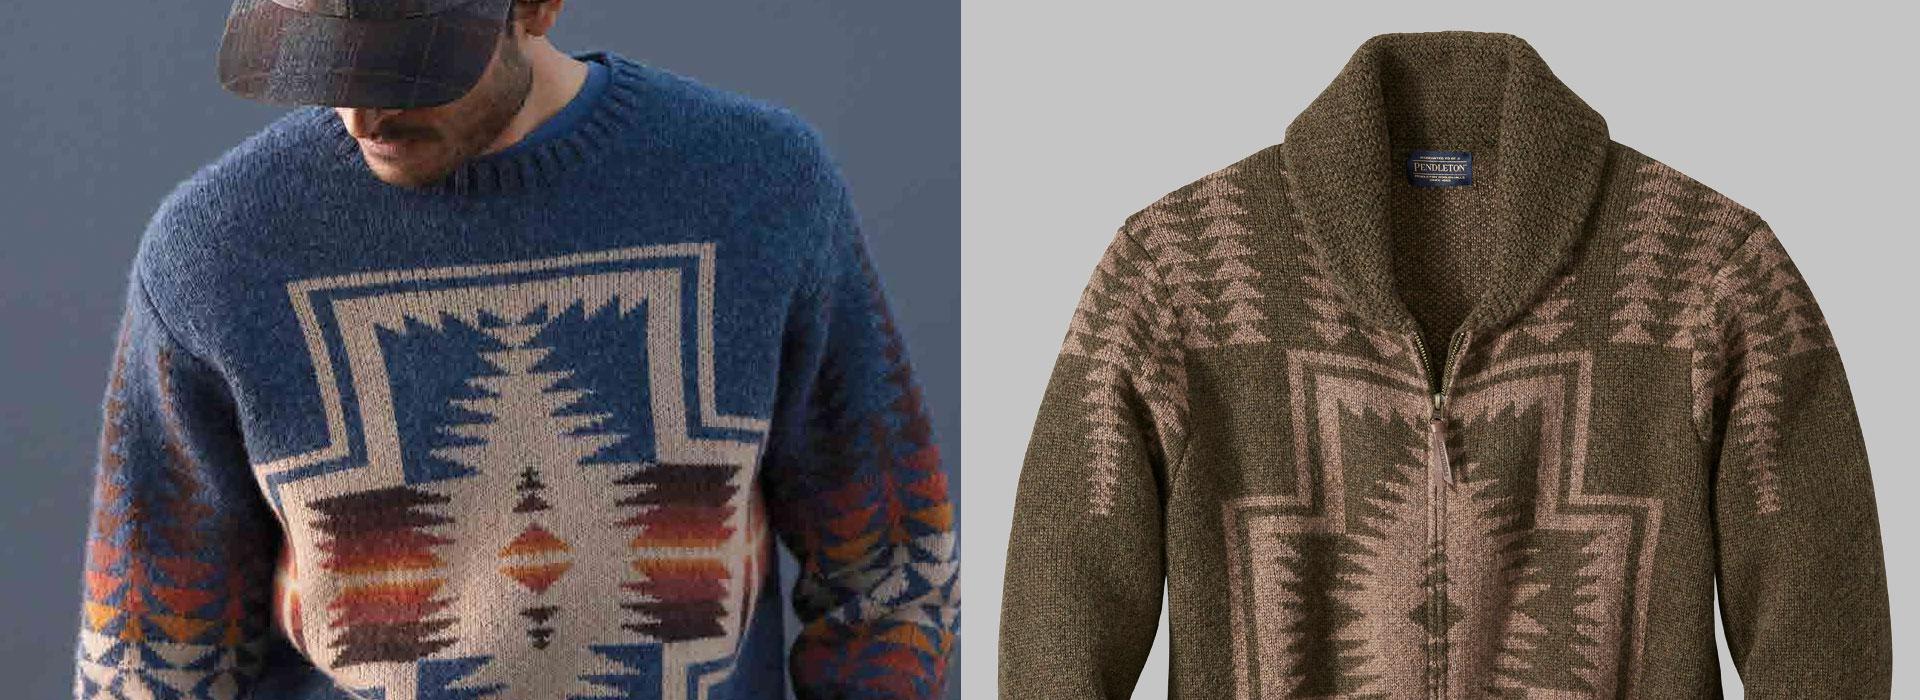 Pendleton Wool Sweaters